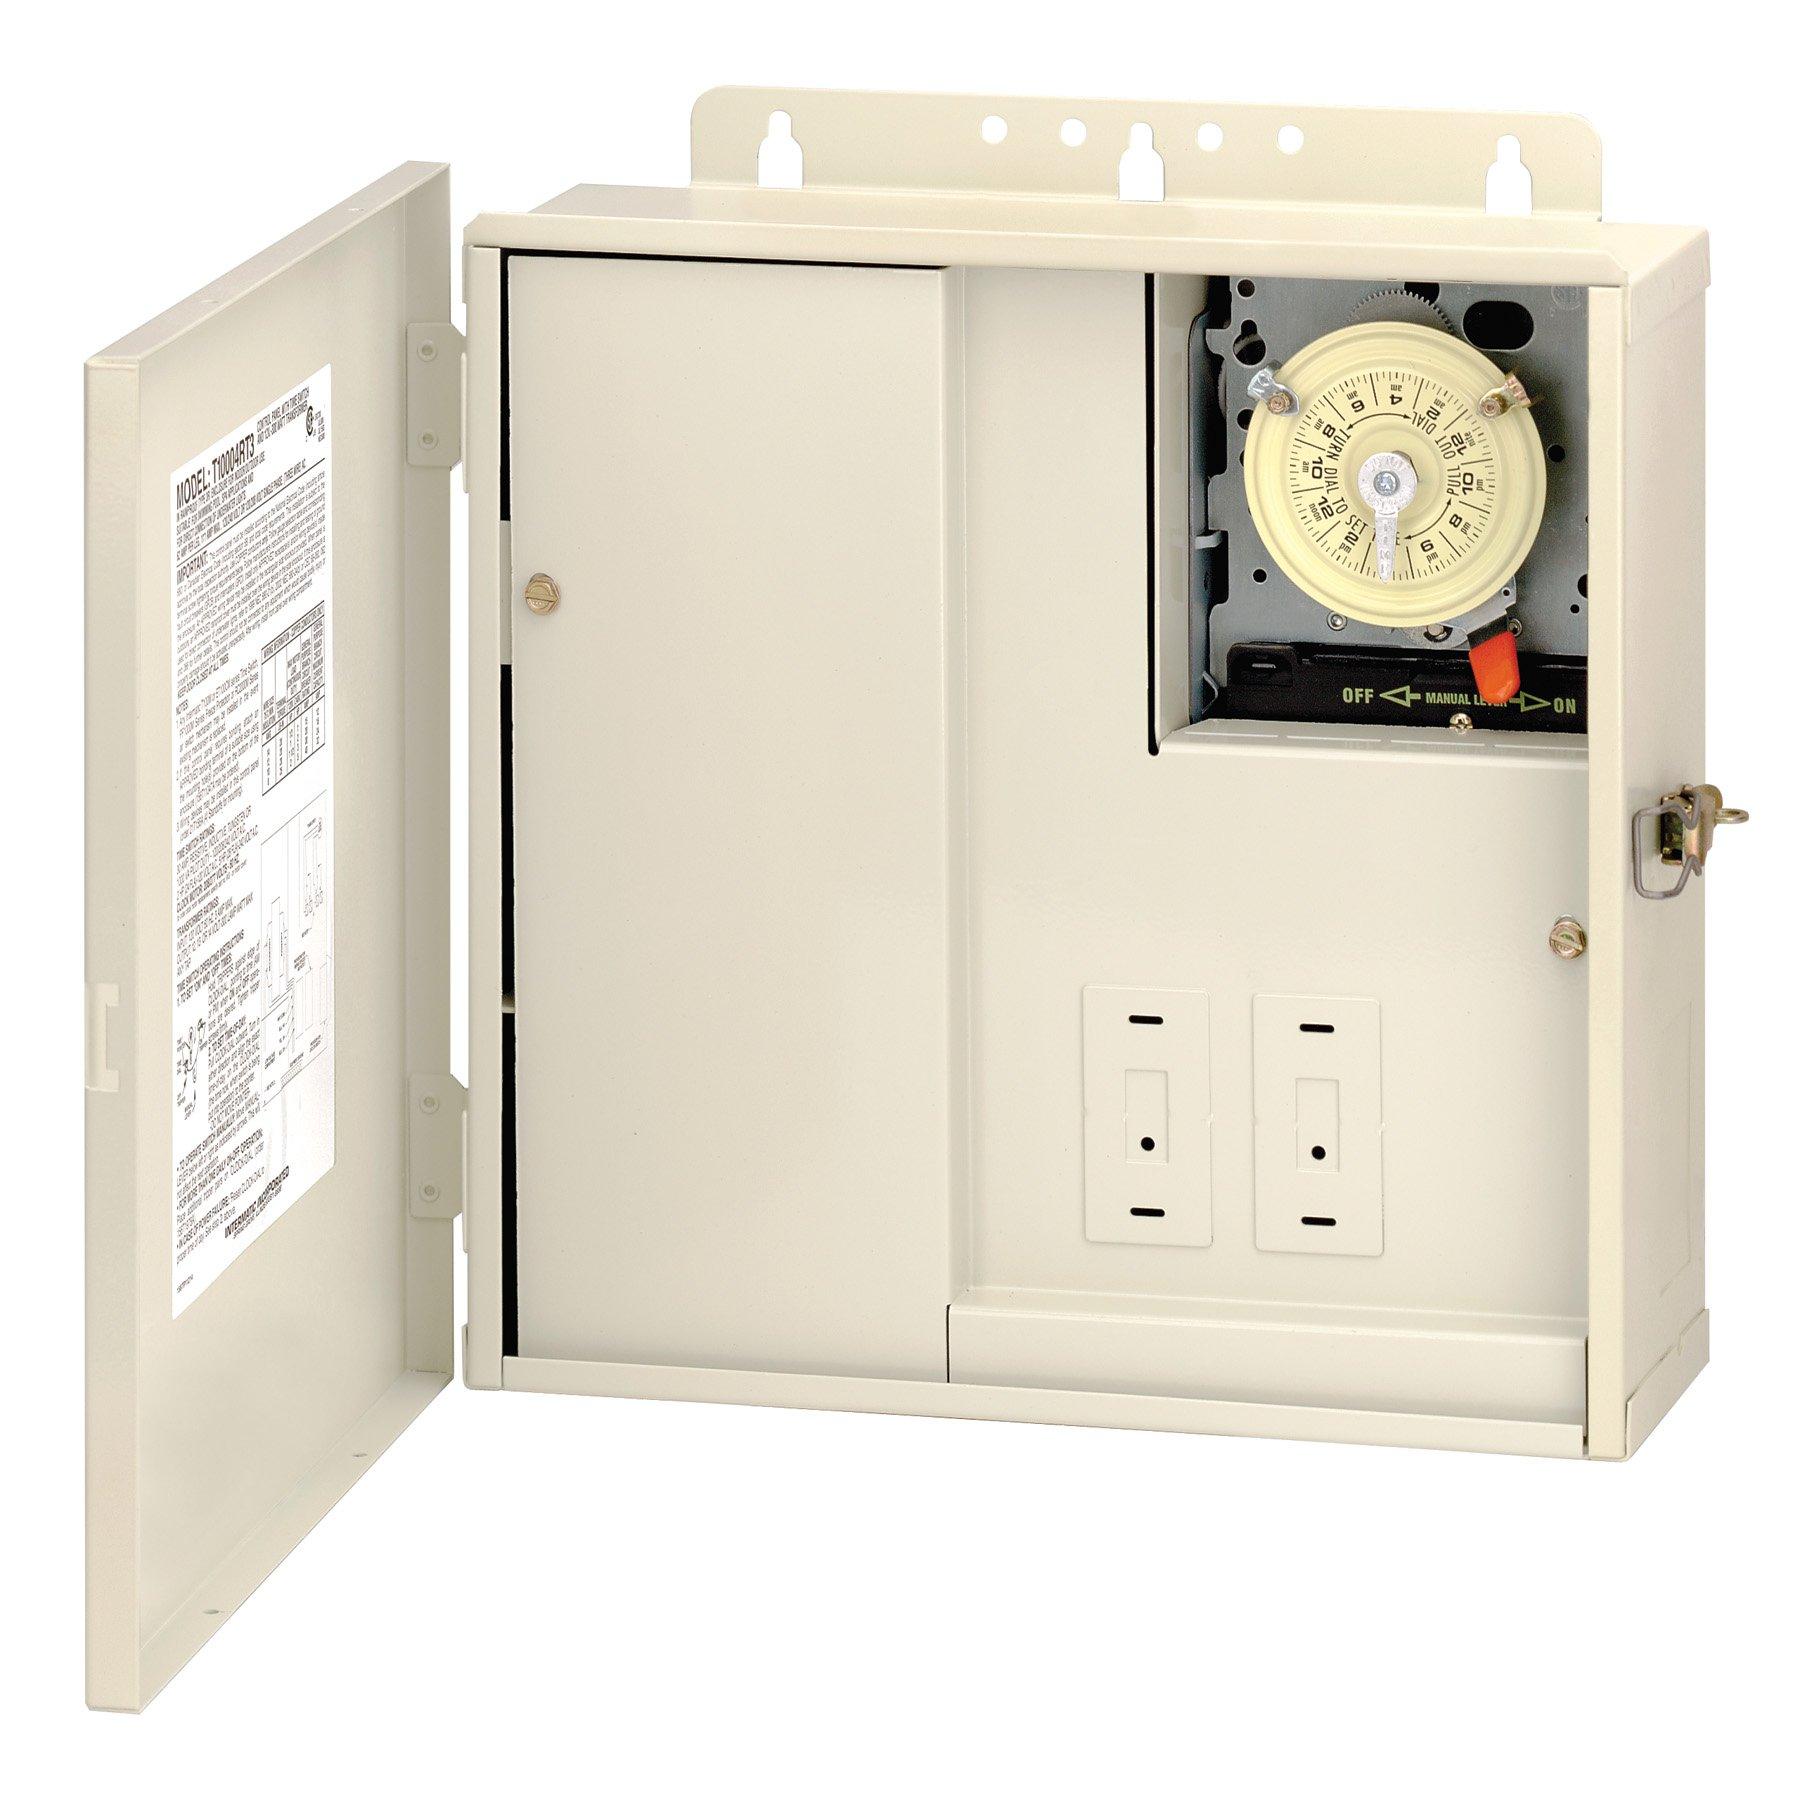 Lighting Components Intermatic T30604R Control Panel Beige Light Bulbs